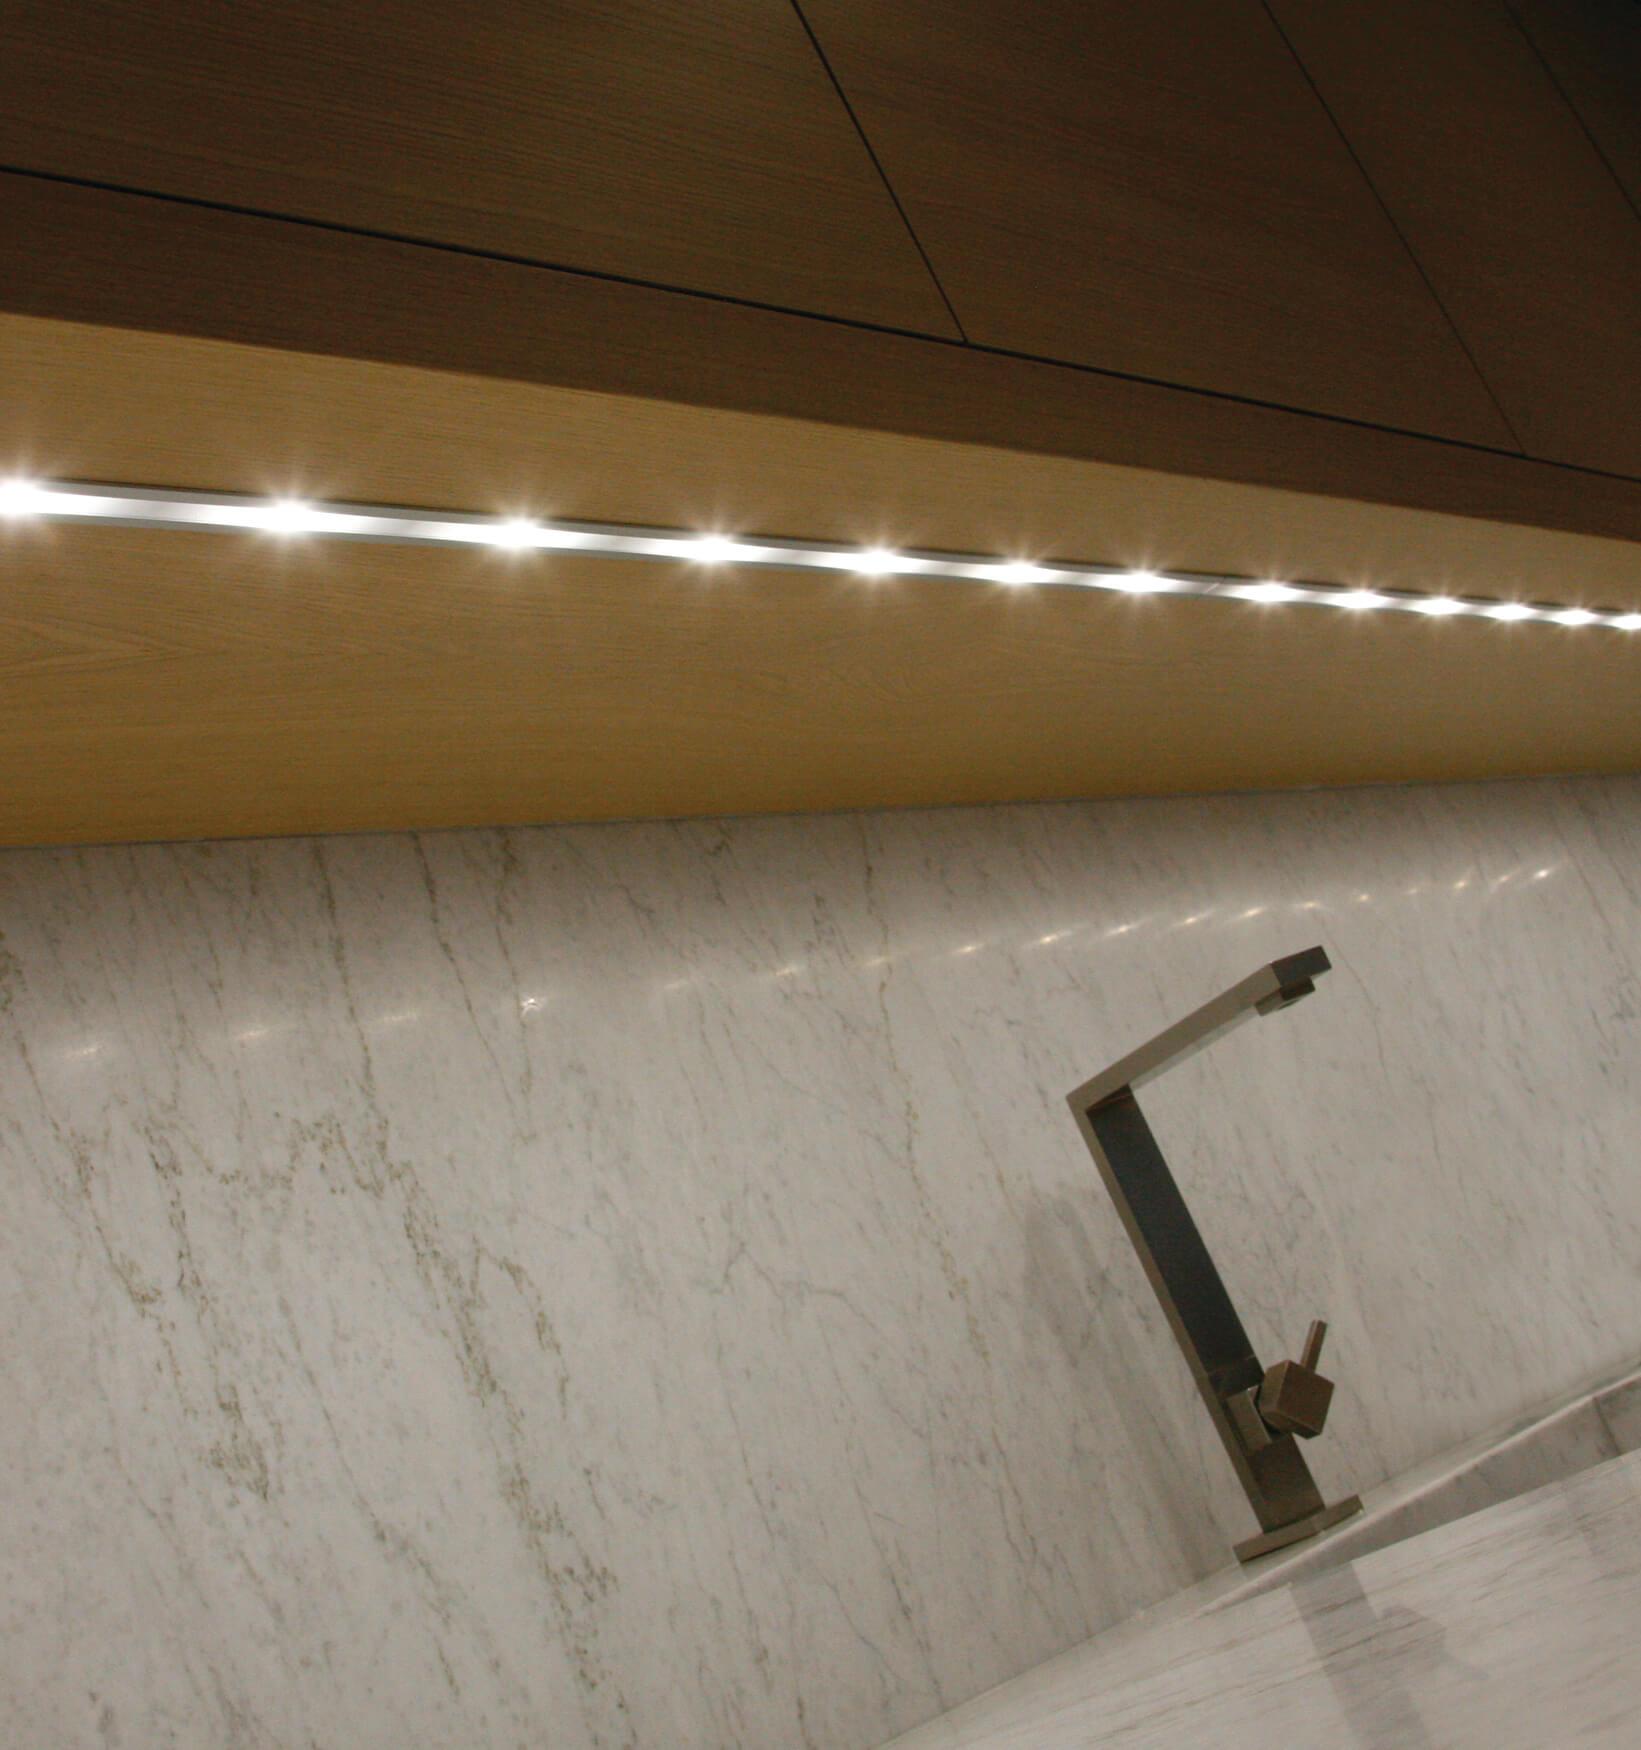 Illuminazione cucina barra sottopensile brillamenti - Illuminazione sottopensile cucina ...